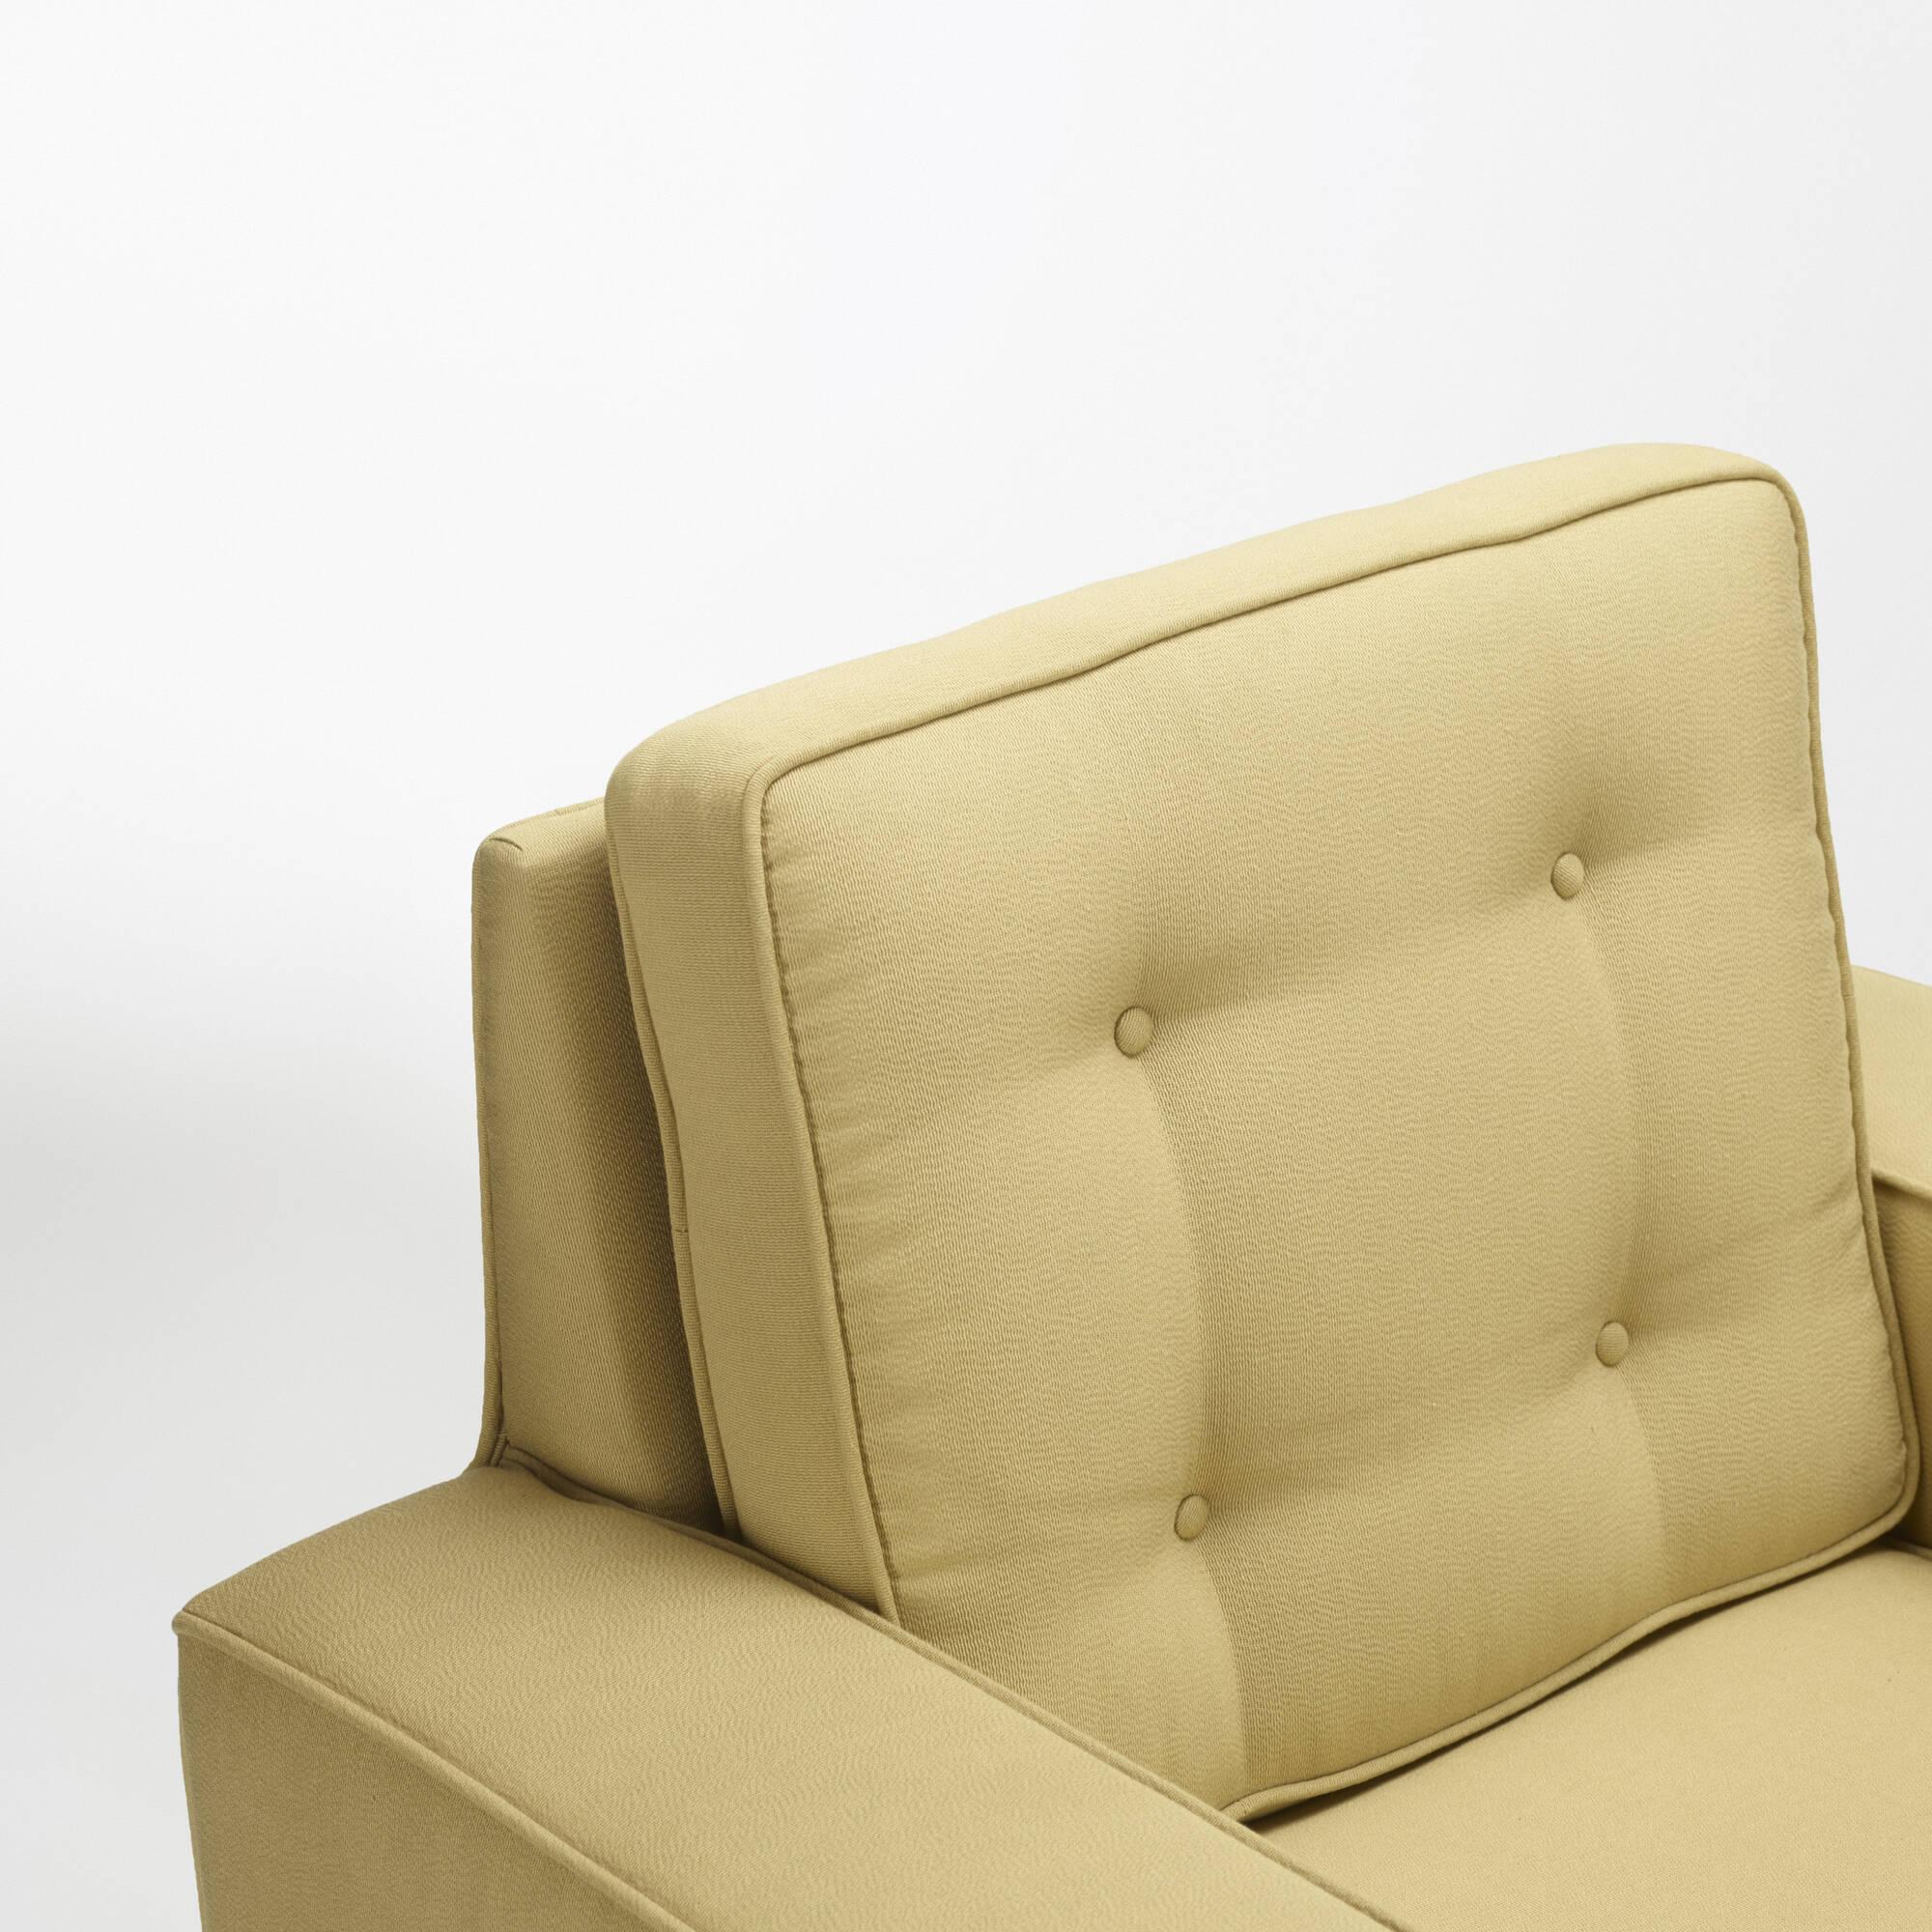 183: Joaquim Tenreiro / lounge chairs, pair (3 of 3)